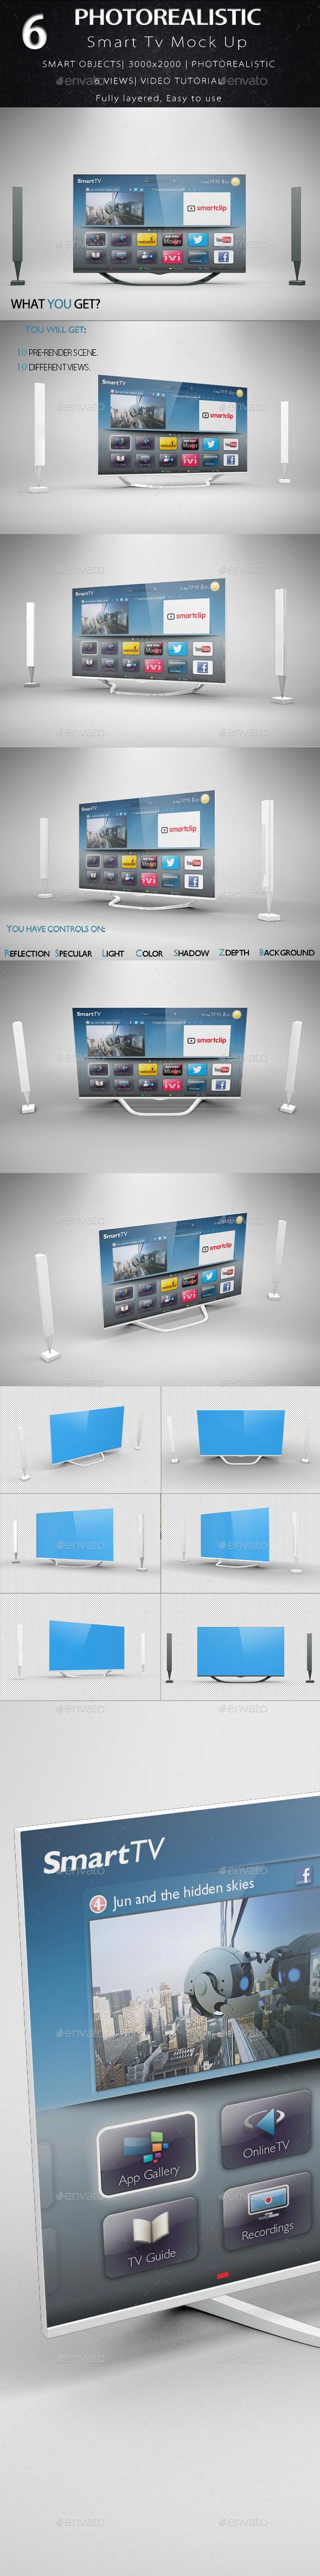 Smart Tv Mock Up - Product Mock-Ups Graphics